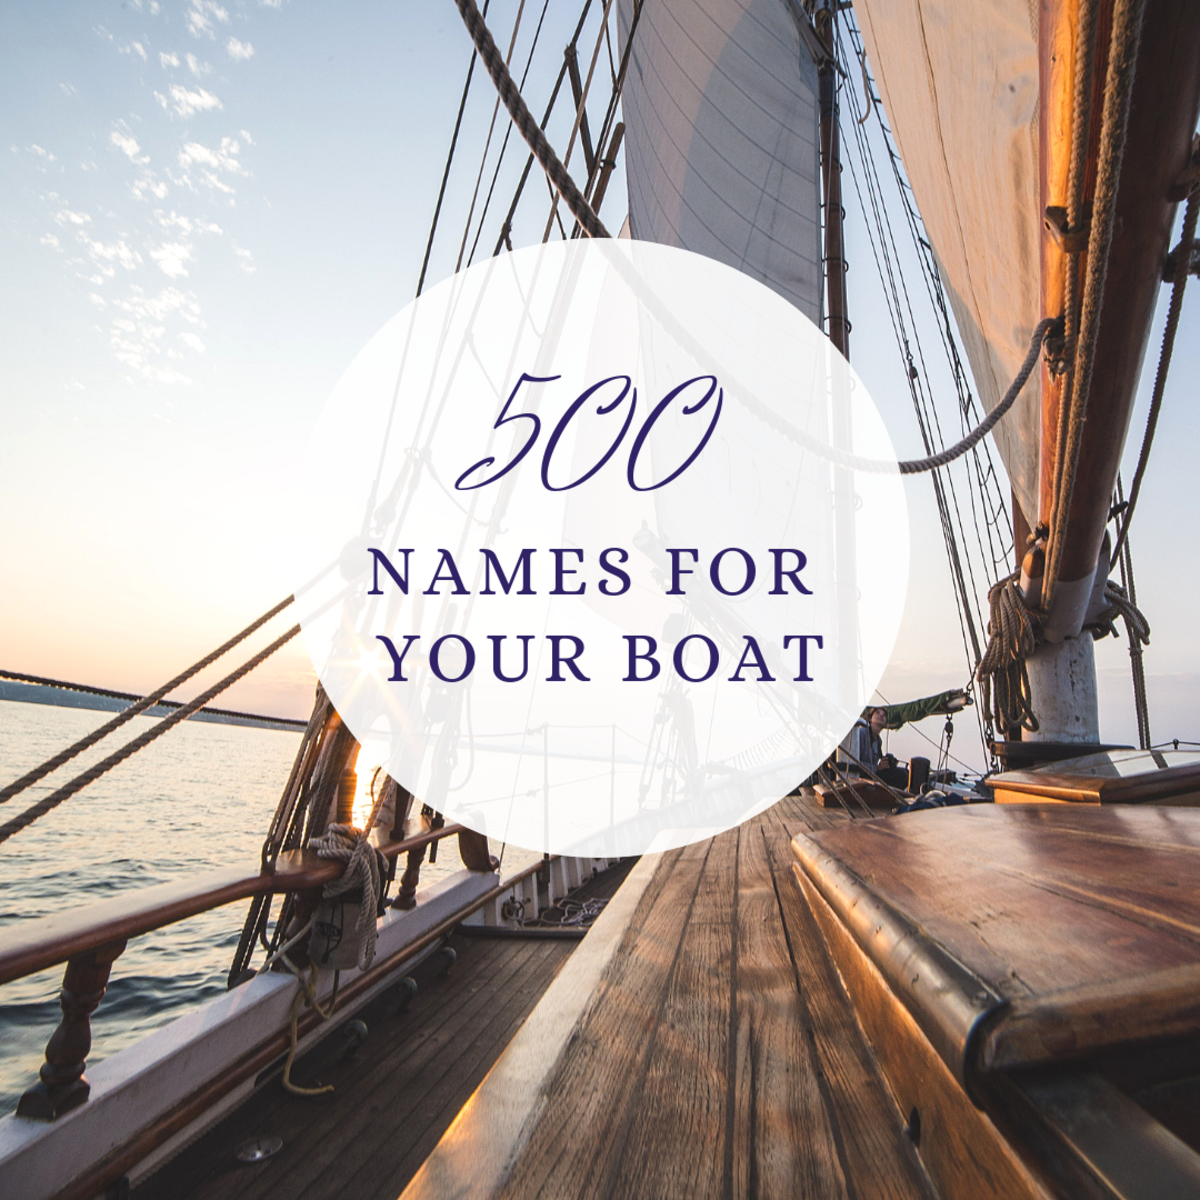 500 Names For Houseboats Fishing Boats And Sailboats Skyaboveus Outdoors